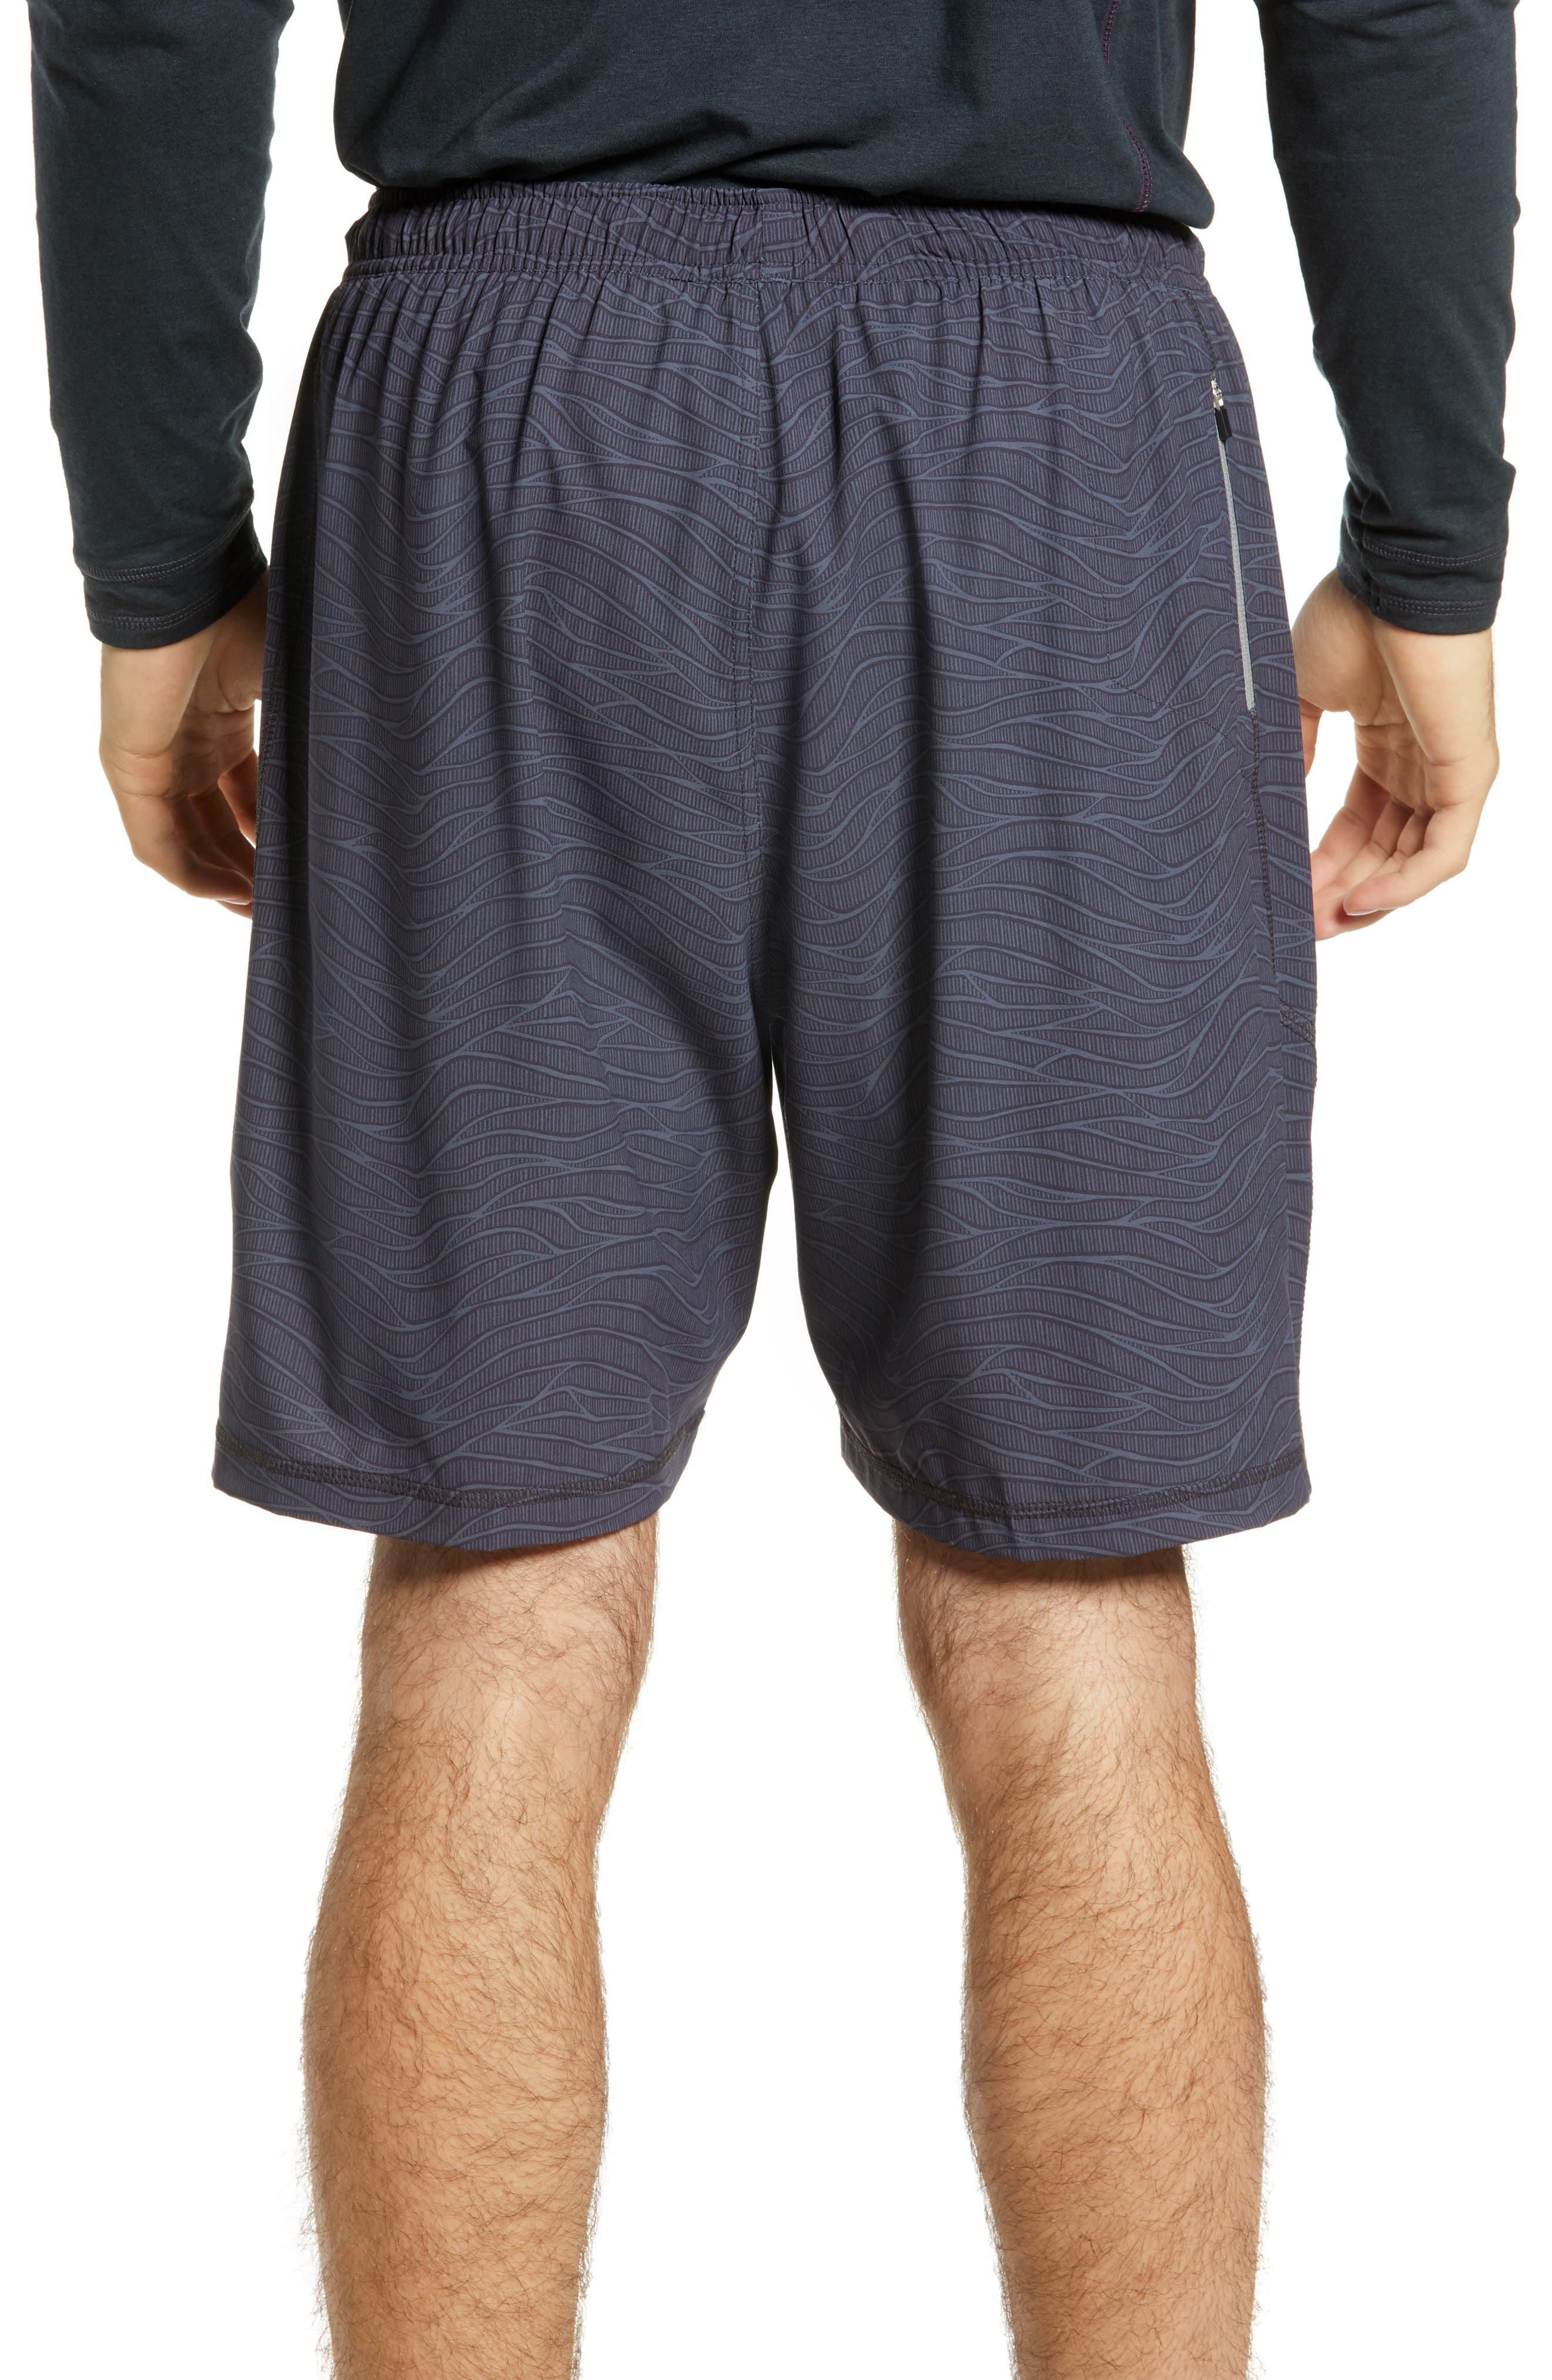 TASC PERFORMANCE, Propulsion Athletic Shorts, Alternate thumbnail 2, color, BLACK SONIC WAVE